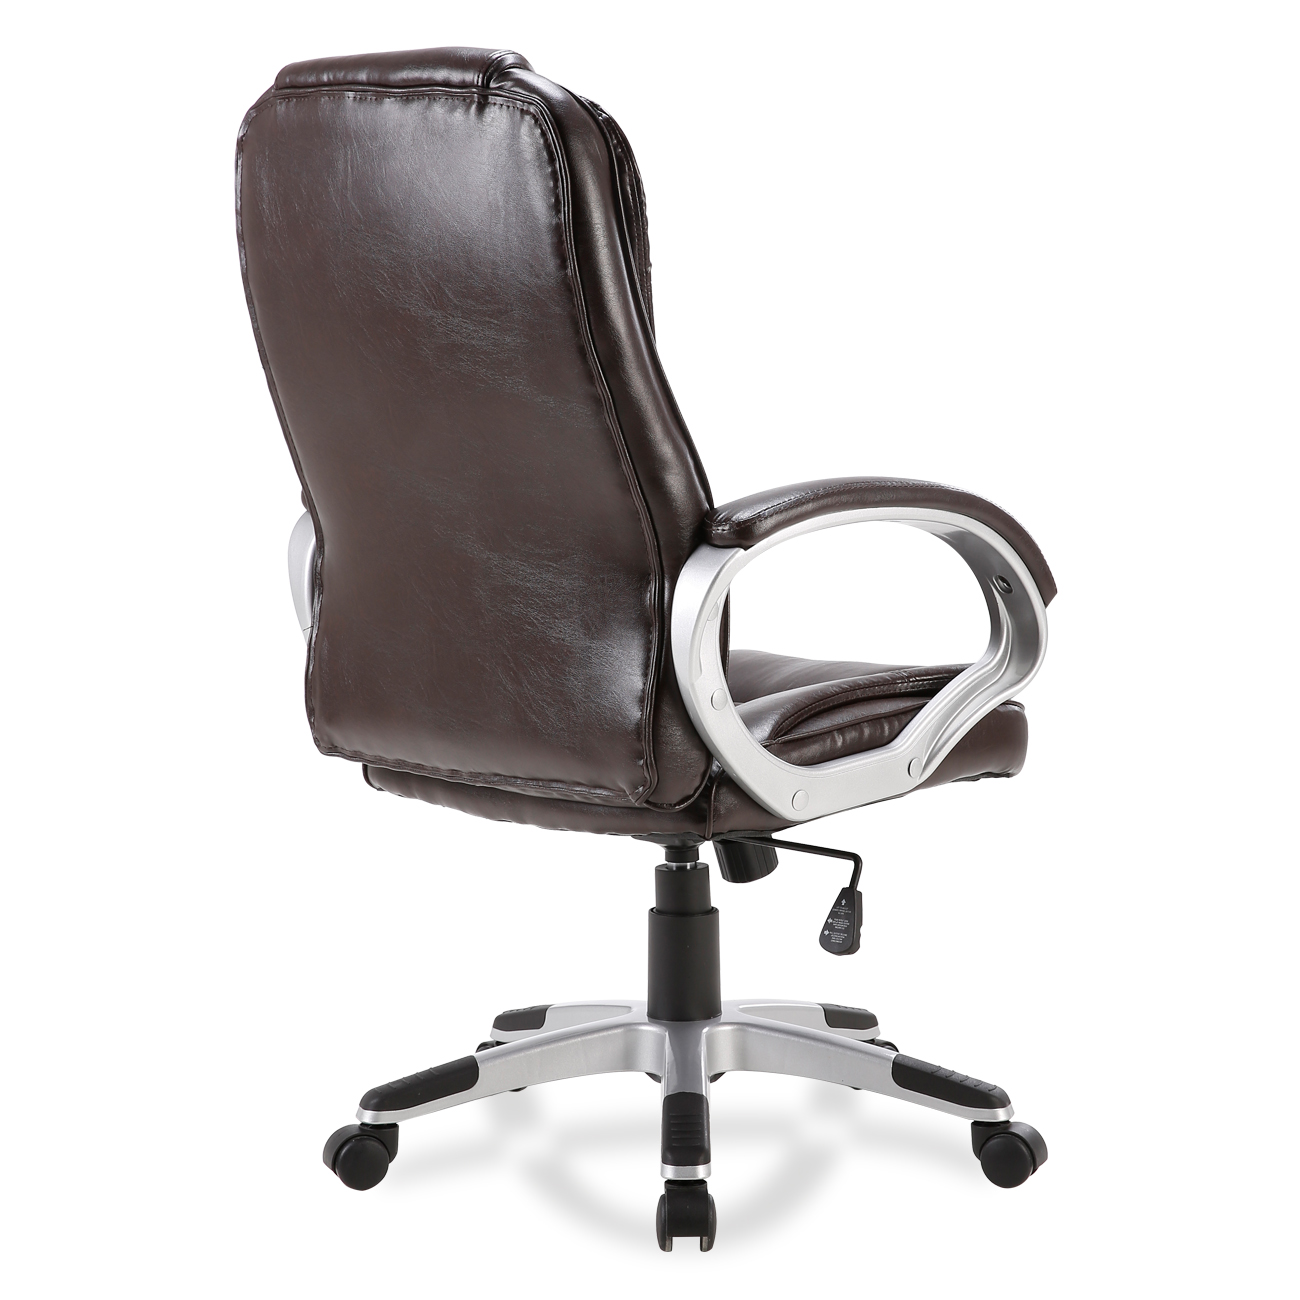 white leather computer chair steel price in kolkata black brown pu modern executive